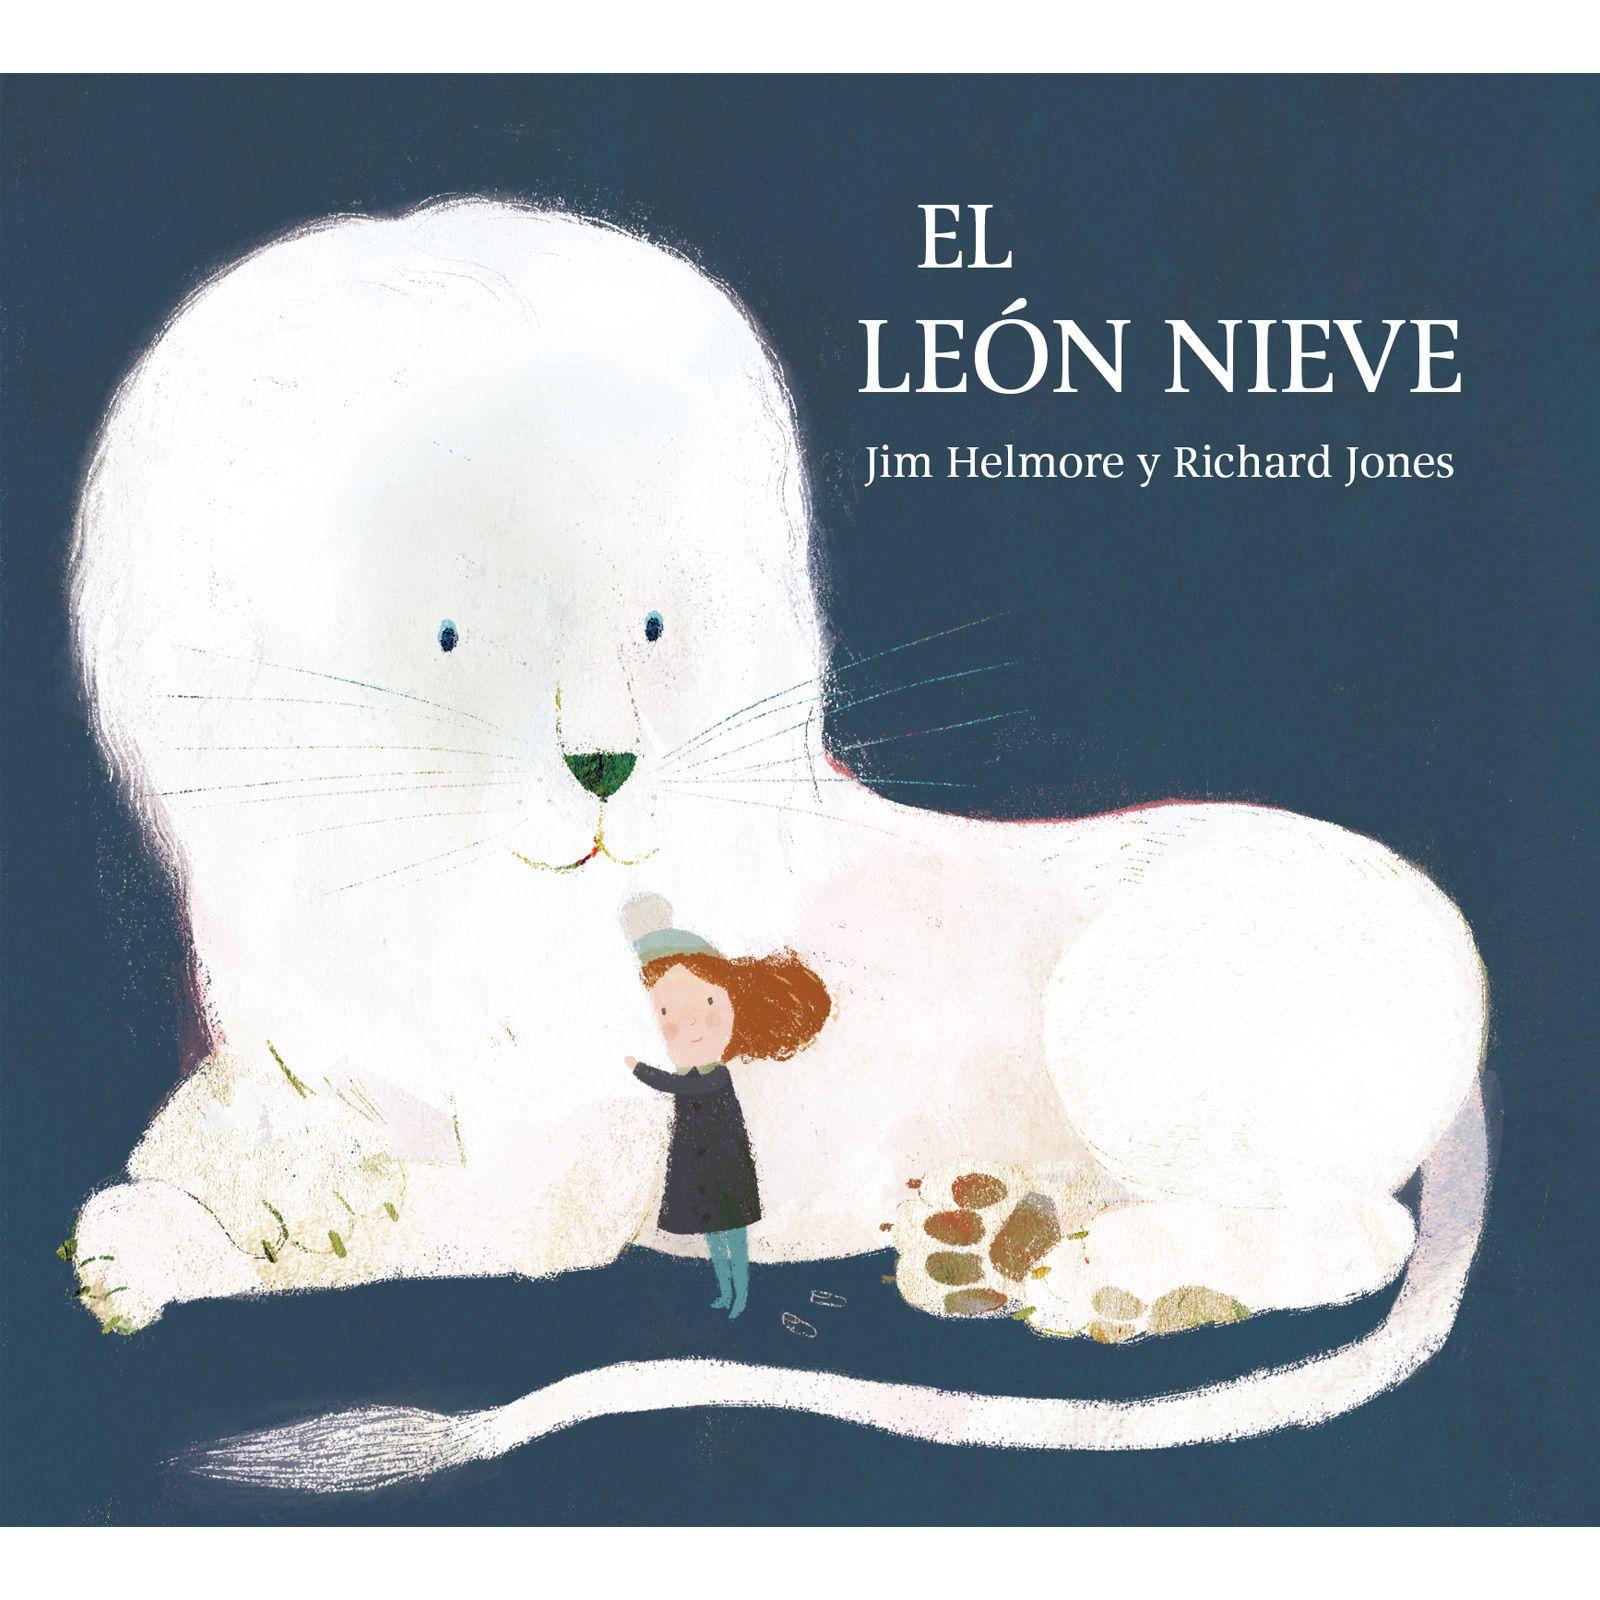 El leon nieve